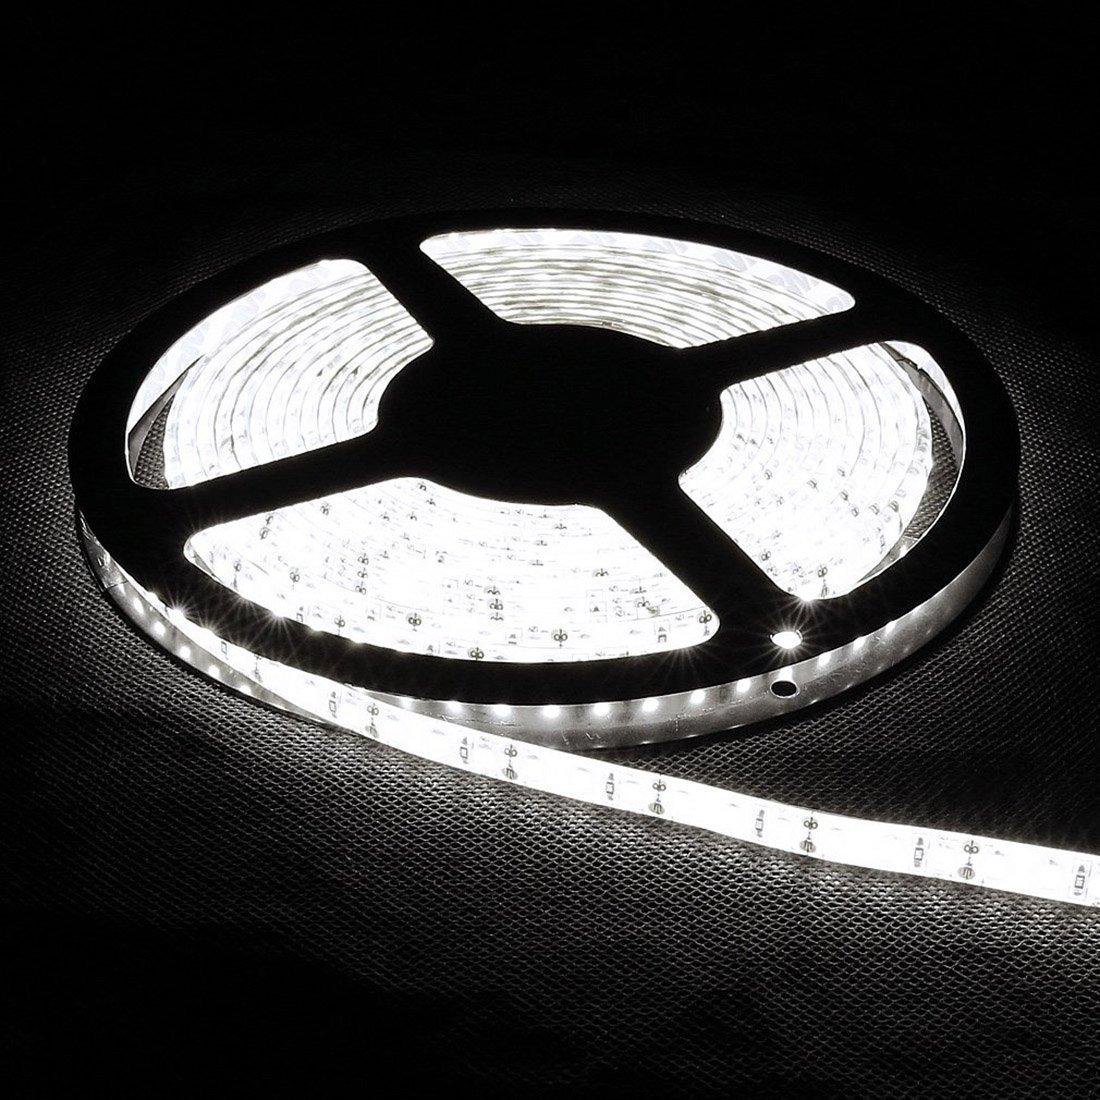 LED Strip Band Lights Remote Controller LED Strip Band Lights SODIAL Flexible 5M DC 12V 72W SMD 2835*600 Leds IP65 Waterproof White R 6500K